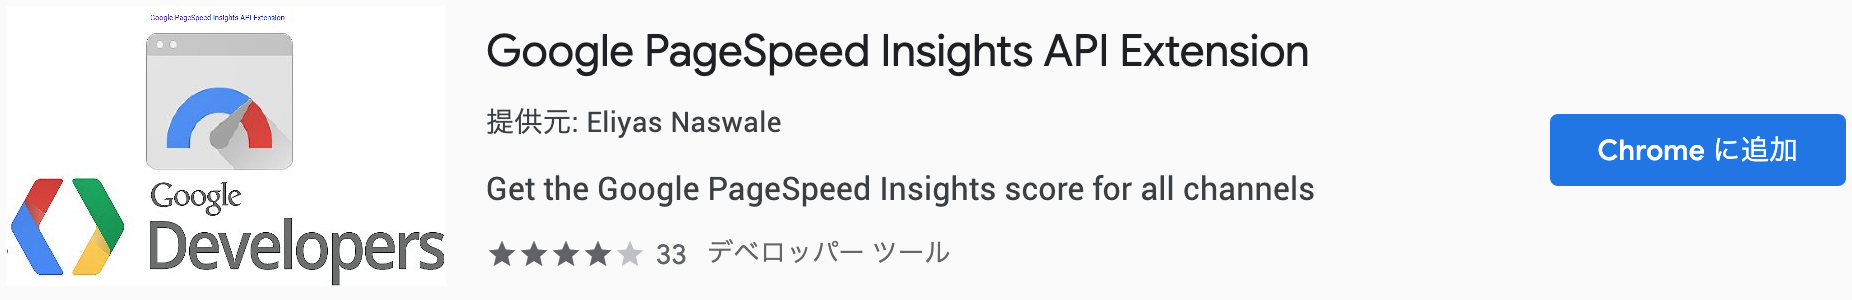 Google PageSpeed Insights API